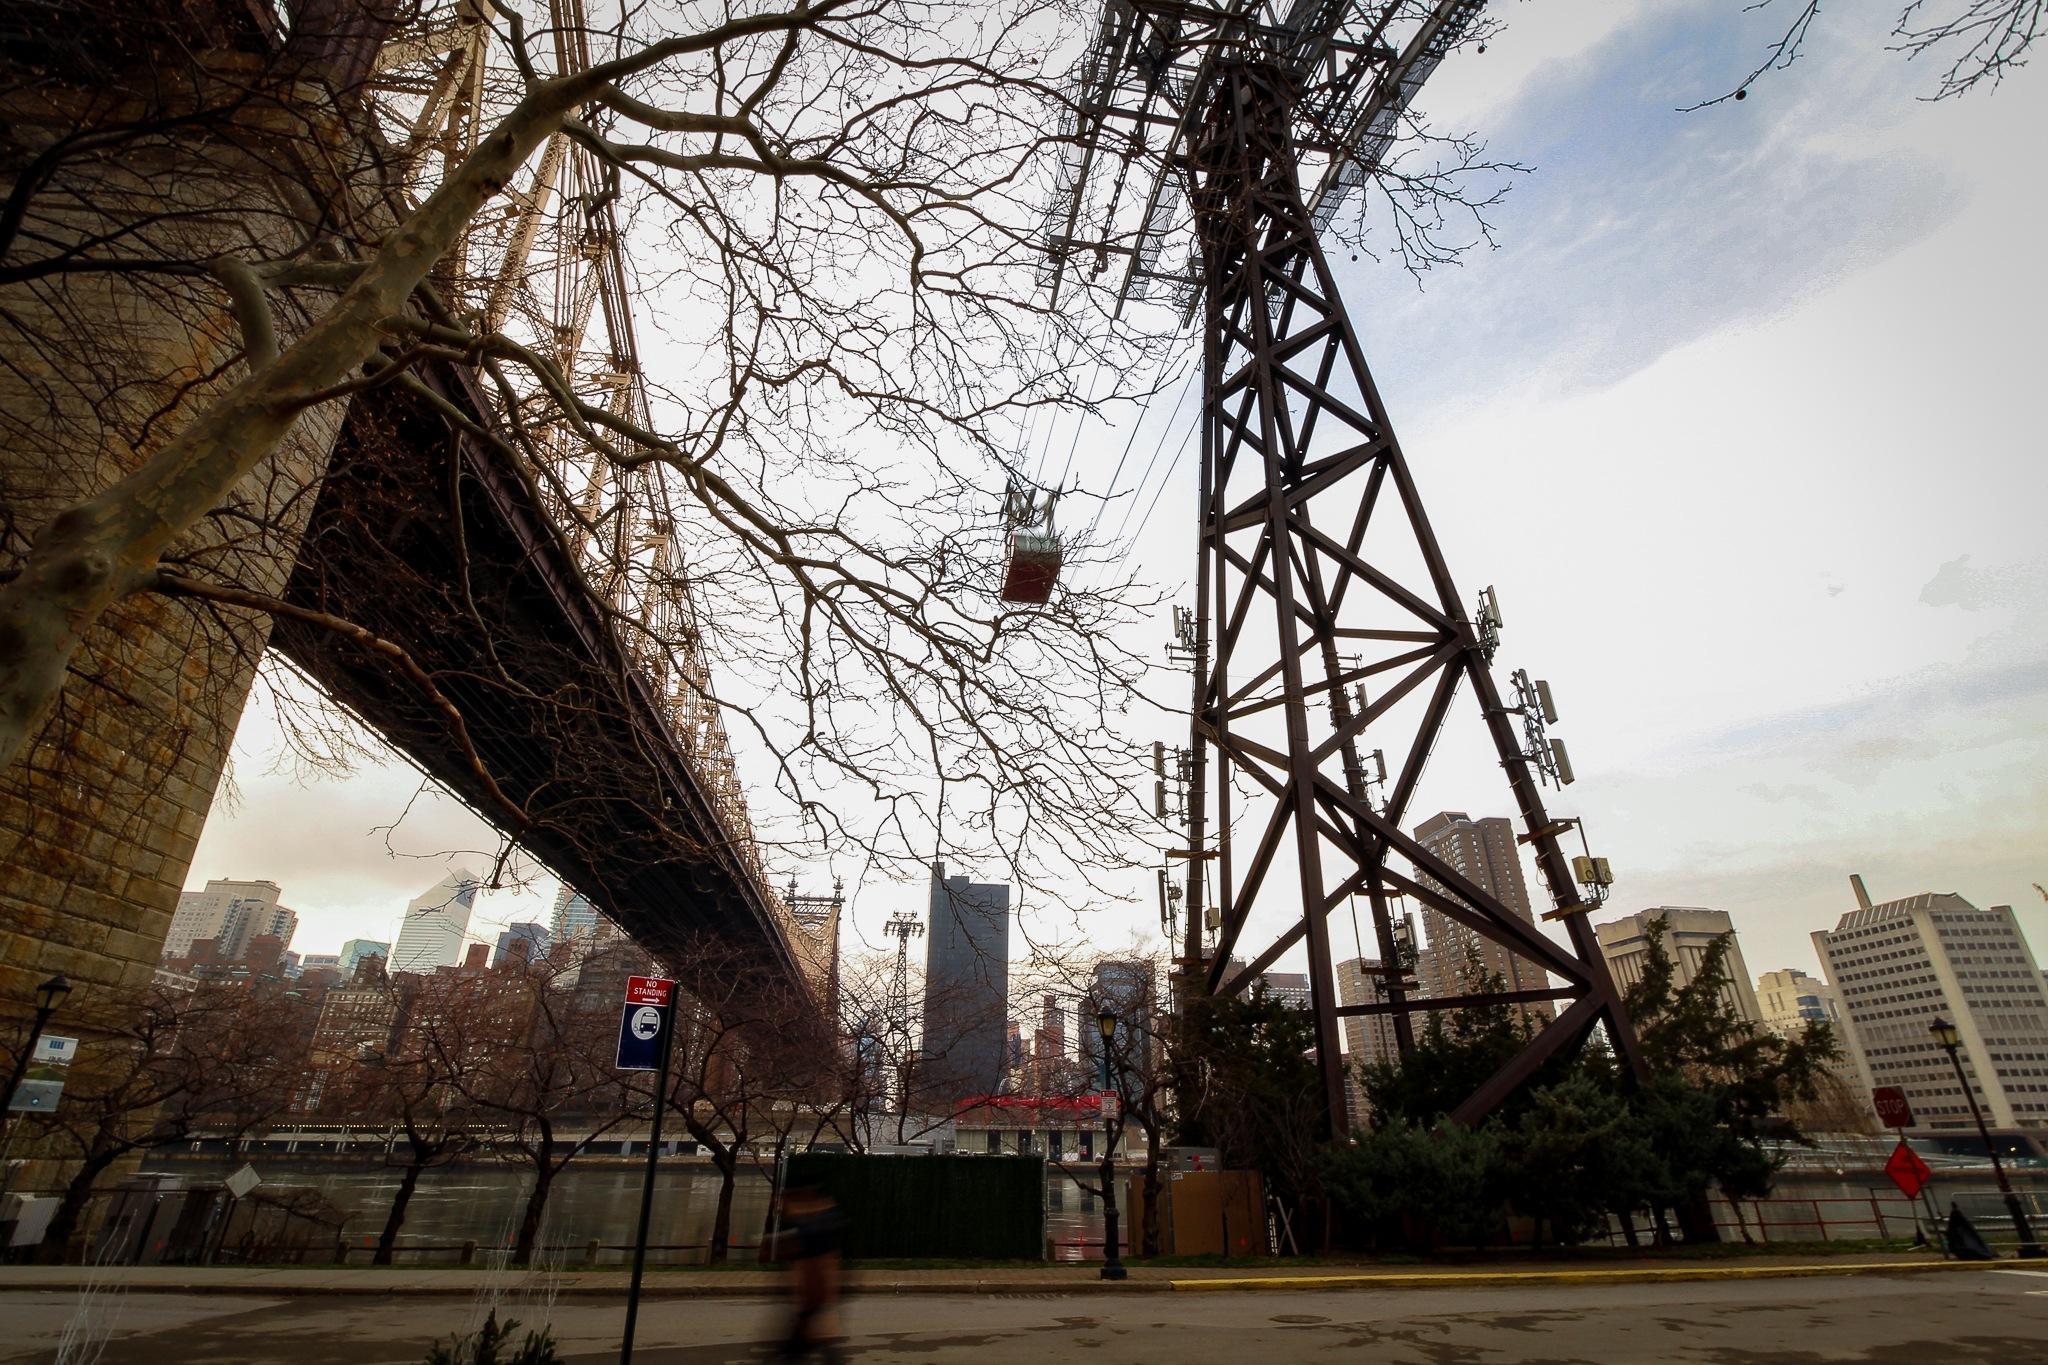 Roosevelt Island Tramway and Queensboro Bridge, New York by Rafael Puerto